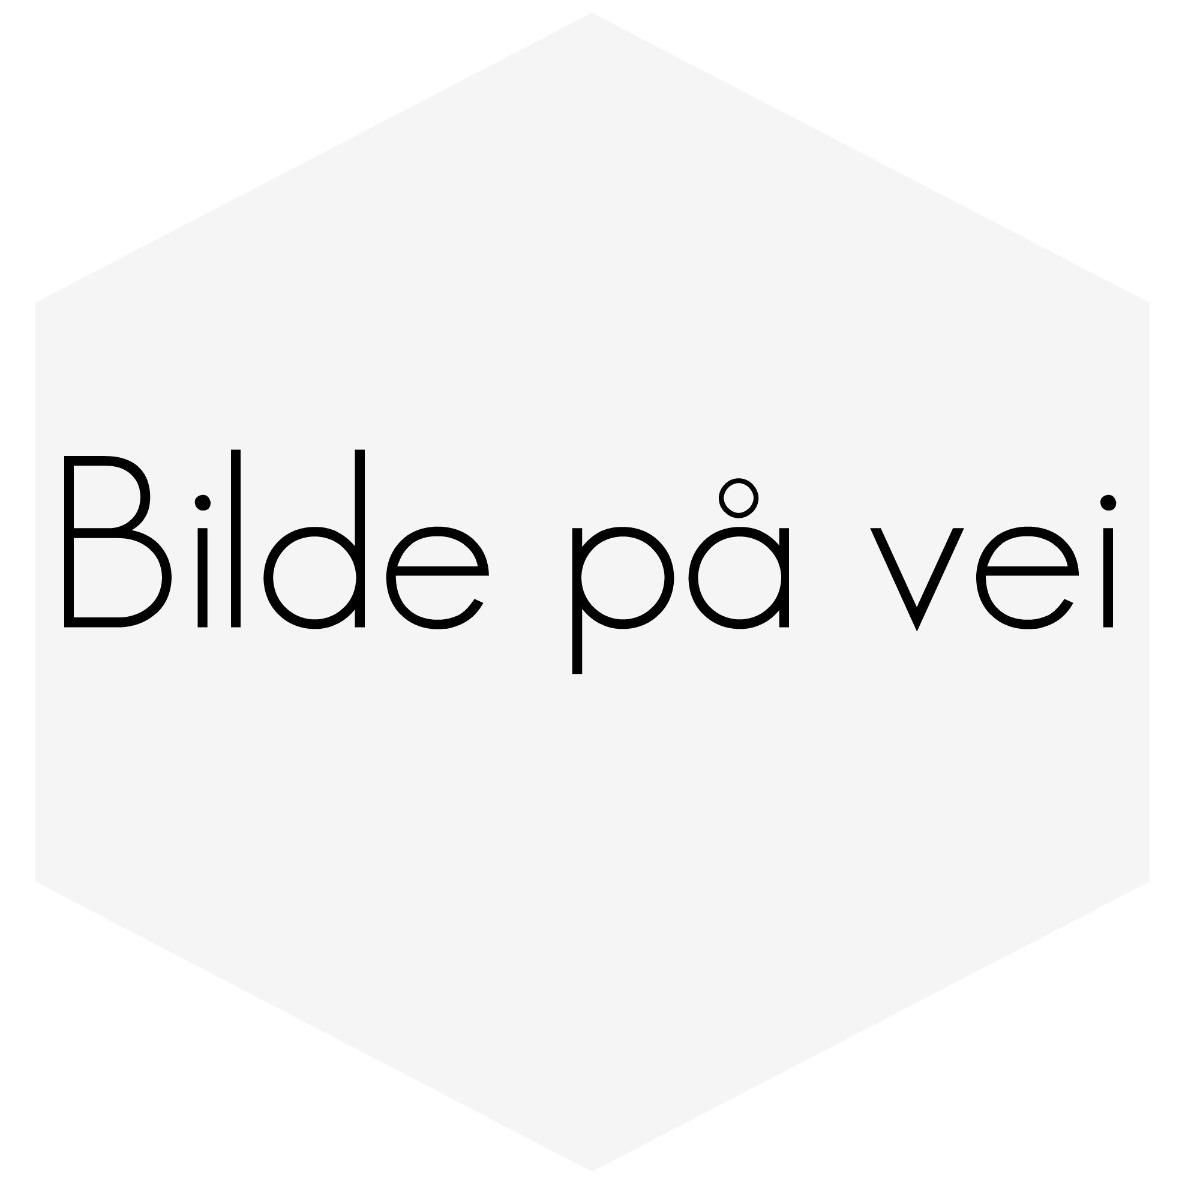 SILIKONSLANGE TILLEGGSATS VOLVO 240 VARMEAPR. + EX.TANK SORT